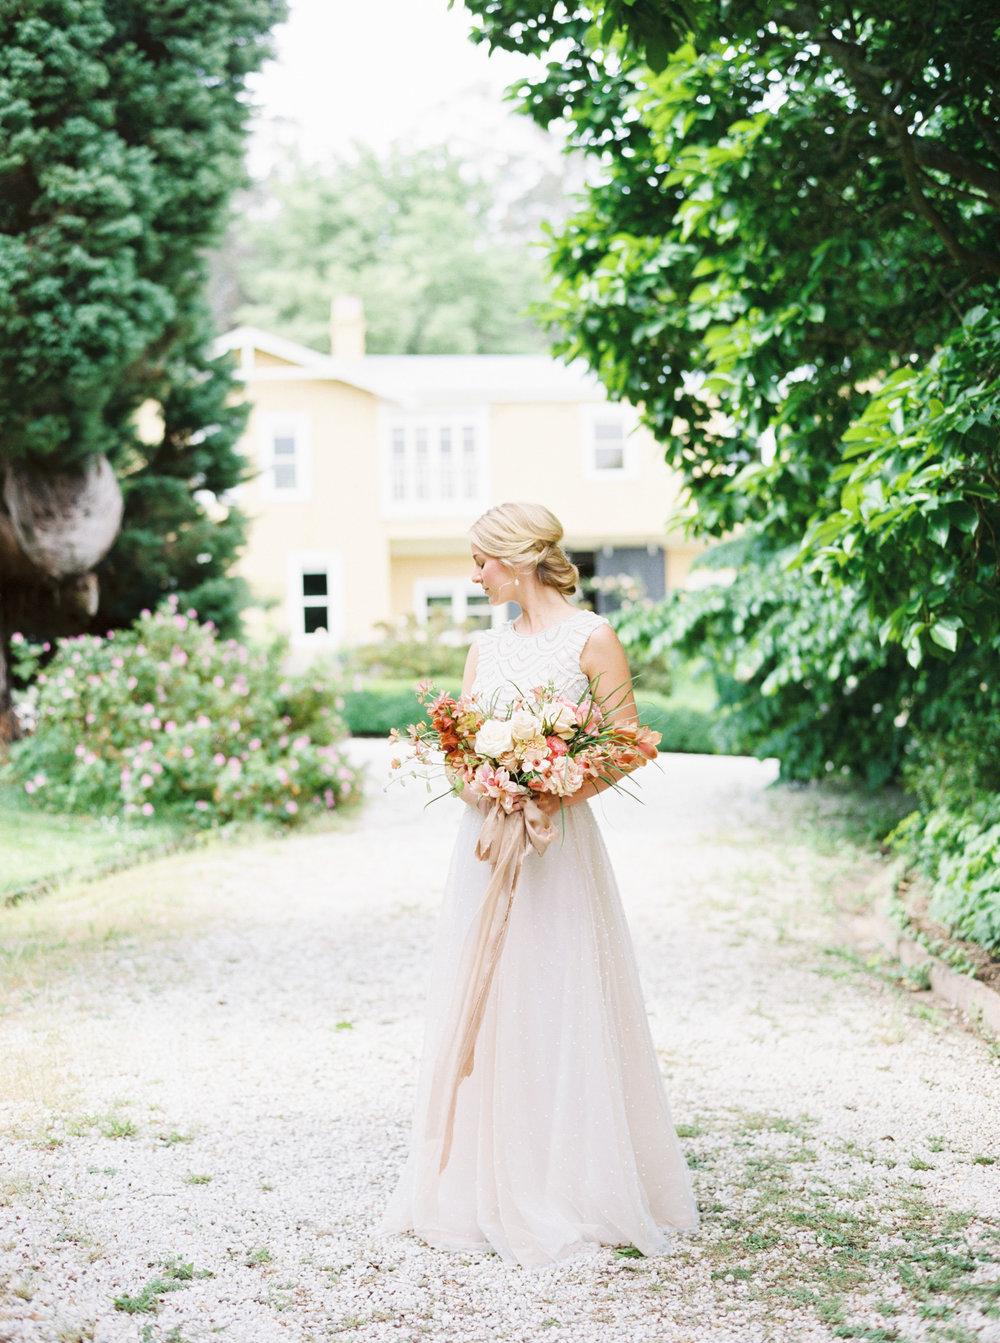 Timeless Southern Highland Wedding Elopement in Bowral NSW Fine Art Film Photographer Sheri McMahon-24.jpg